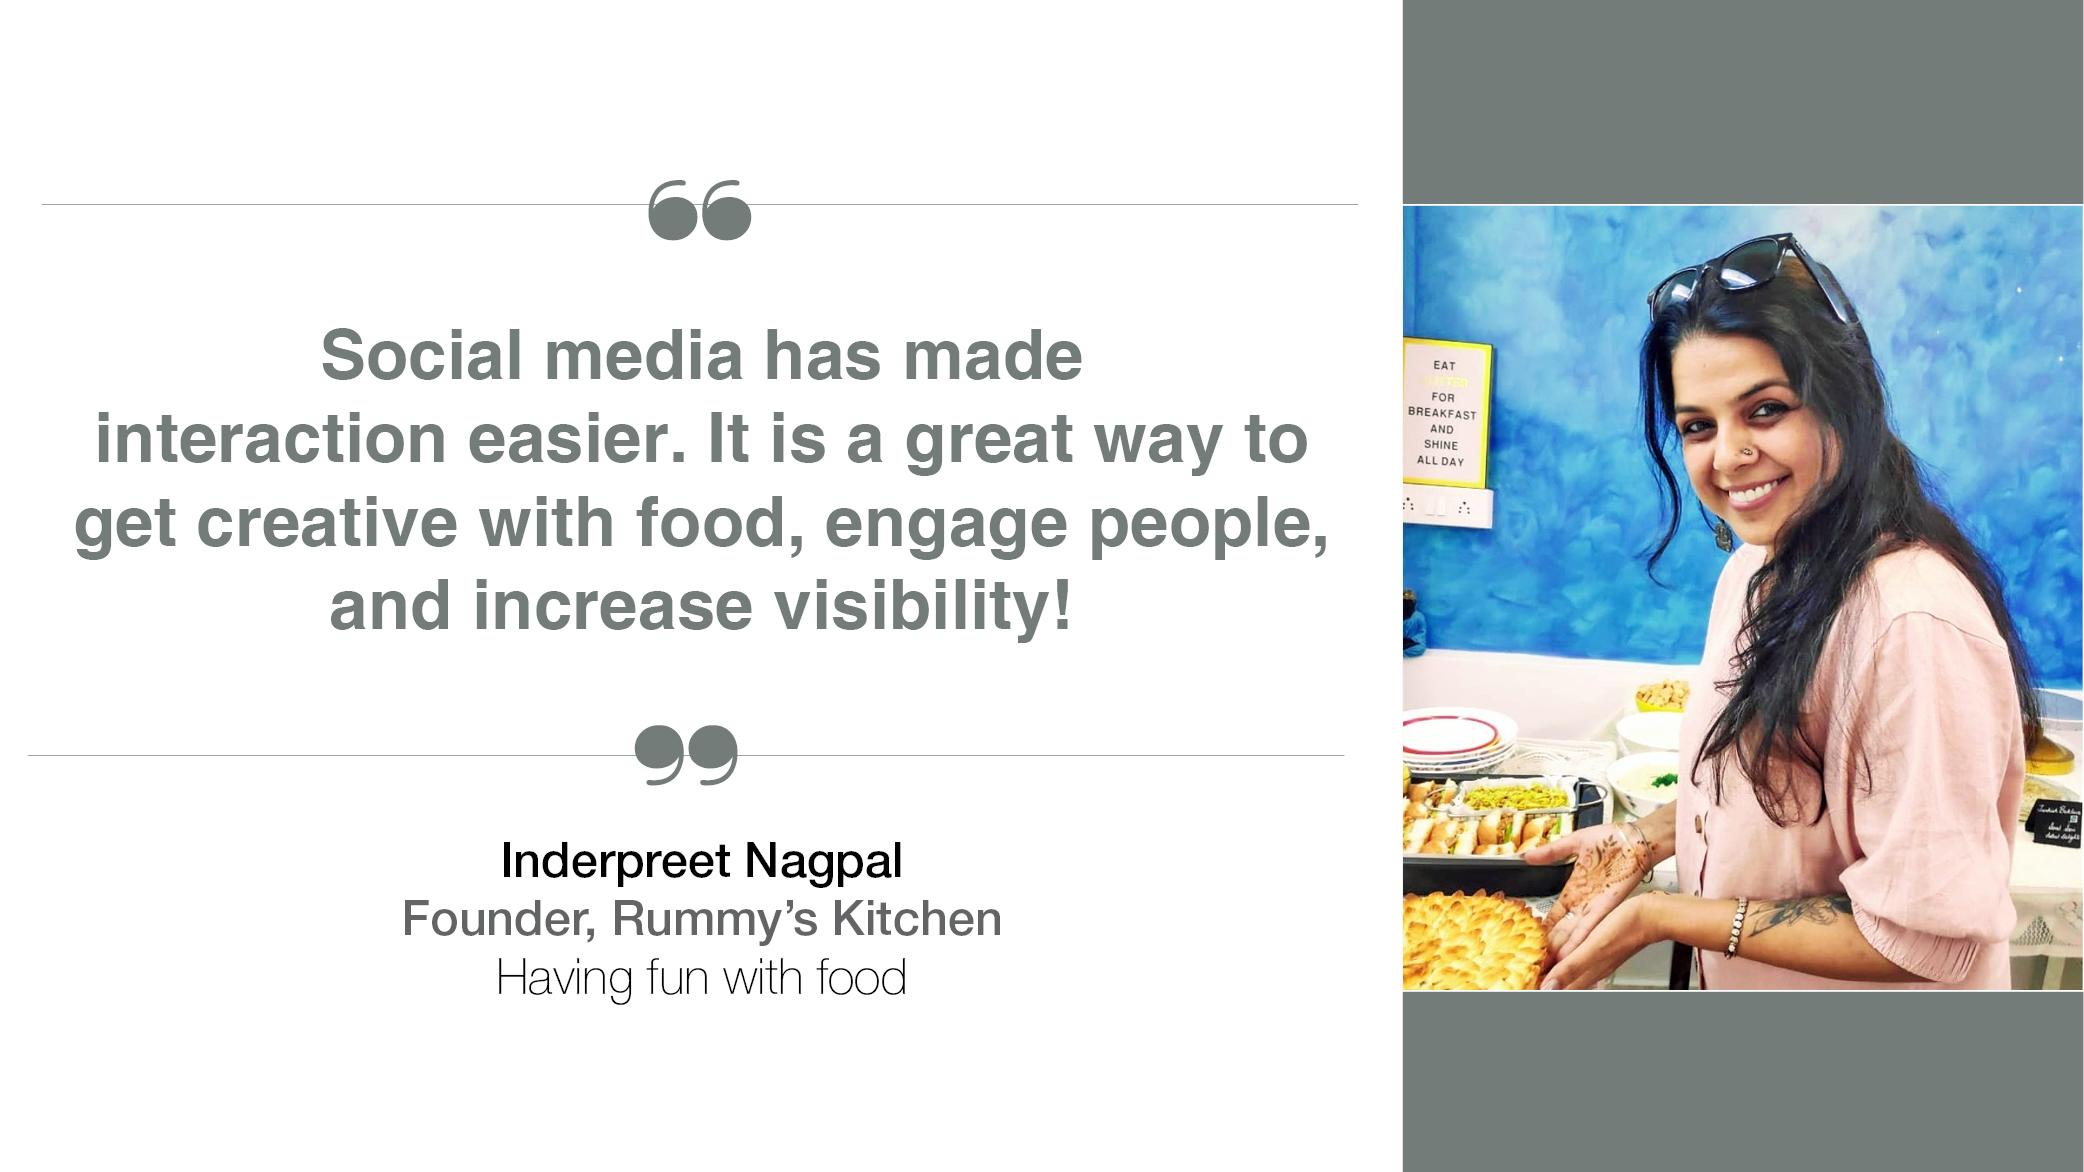 Inderpreet Nagpal Rummy's Kitchen